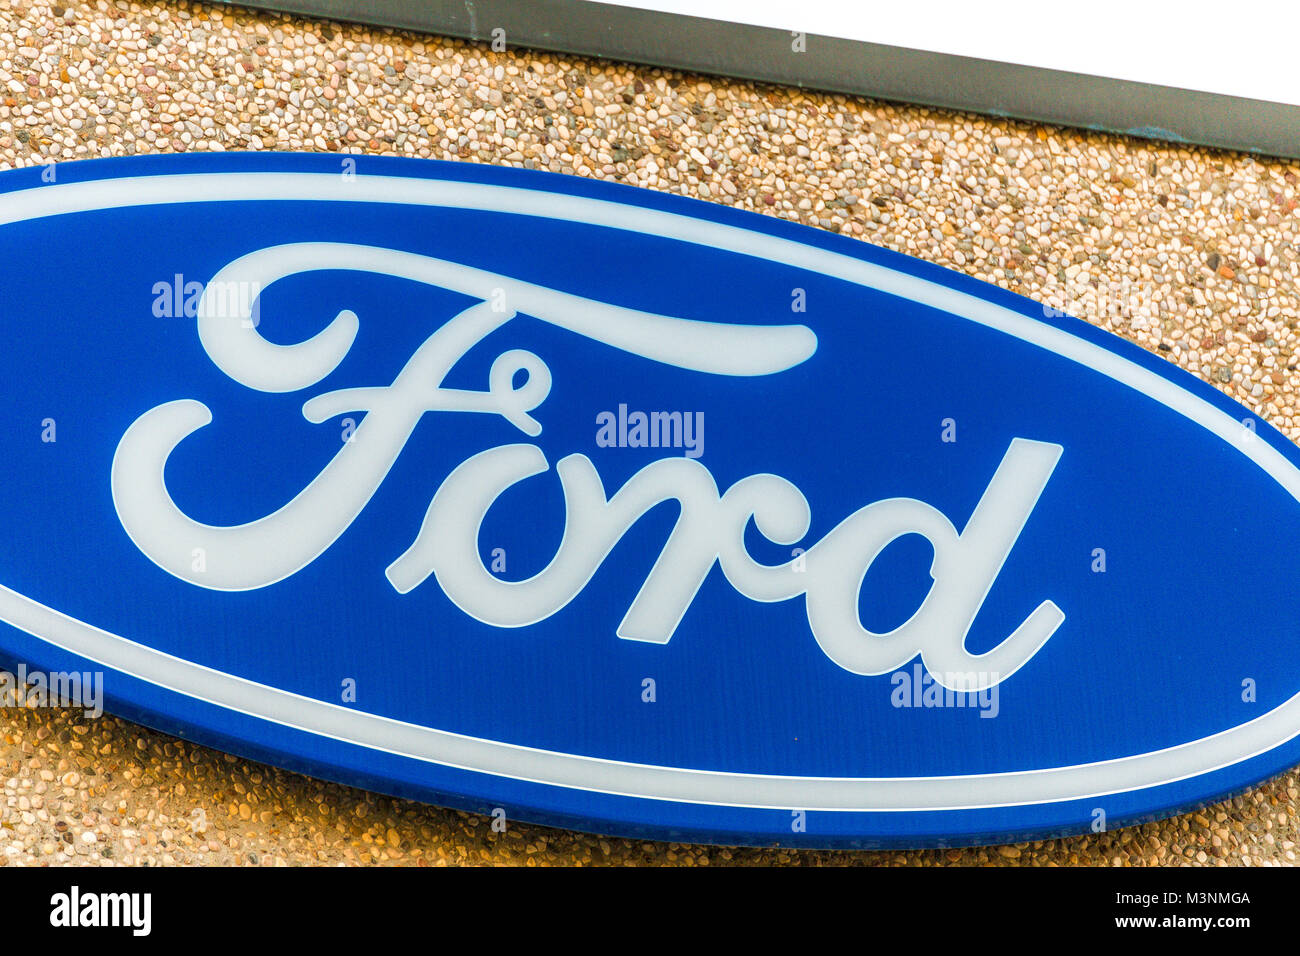 LUGO (RA) - 11. FEBRUAR 2018: Ford Logo auf den Aufbau des Betriebs. Ford Motor Company ist der fünftgrößte Stockbild